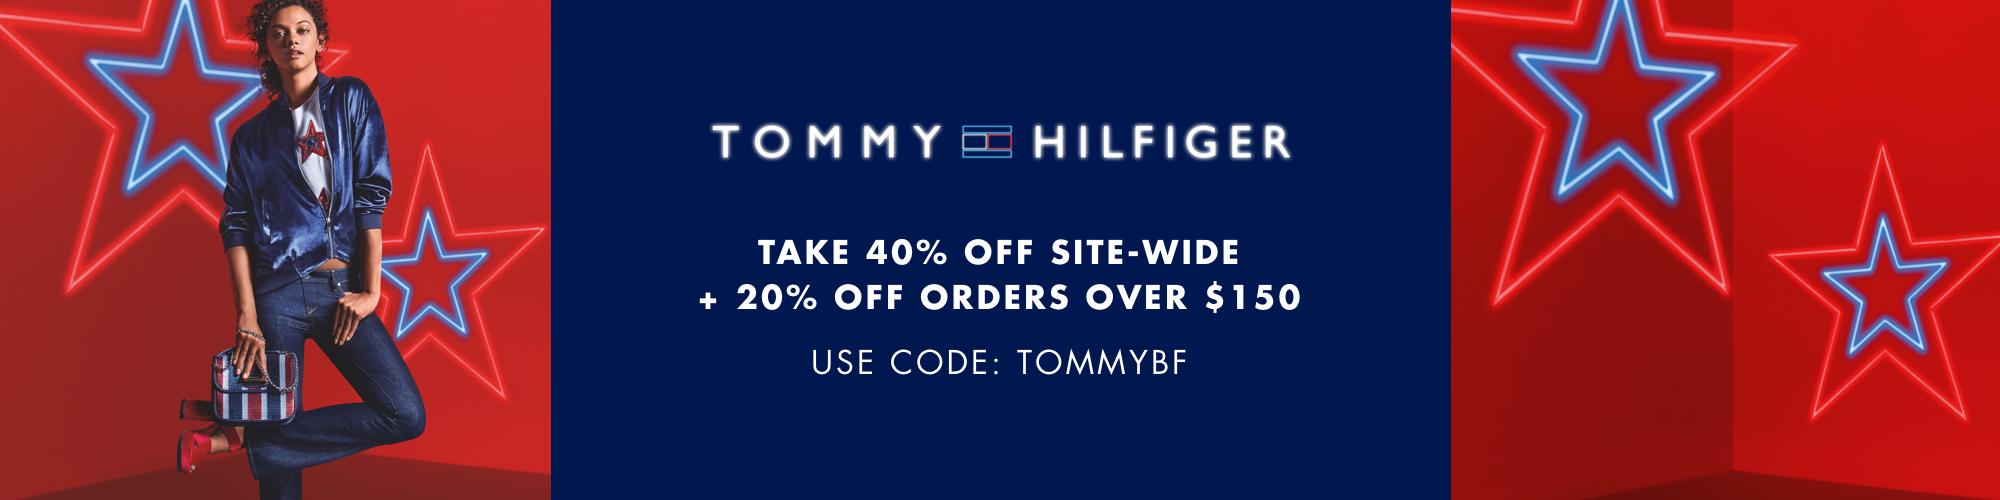 Tommy Hilfiger Black Friday 2020 Ad